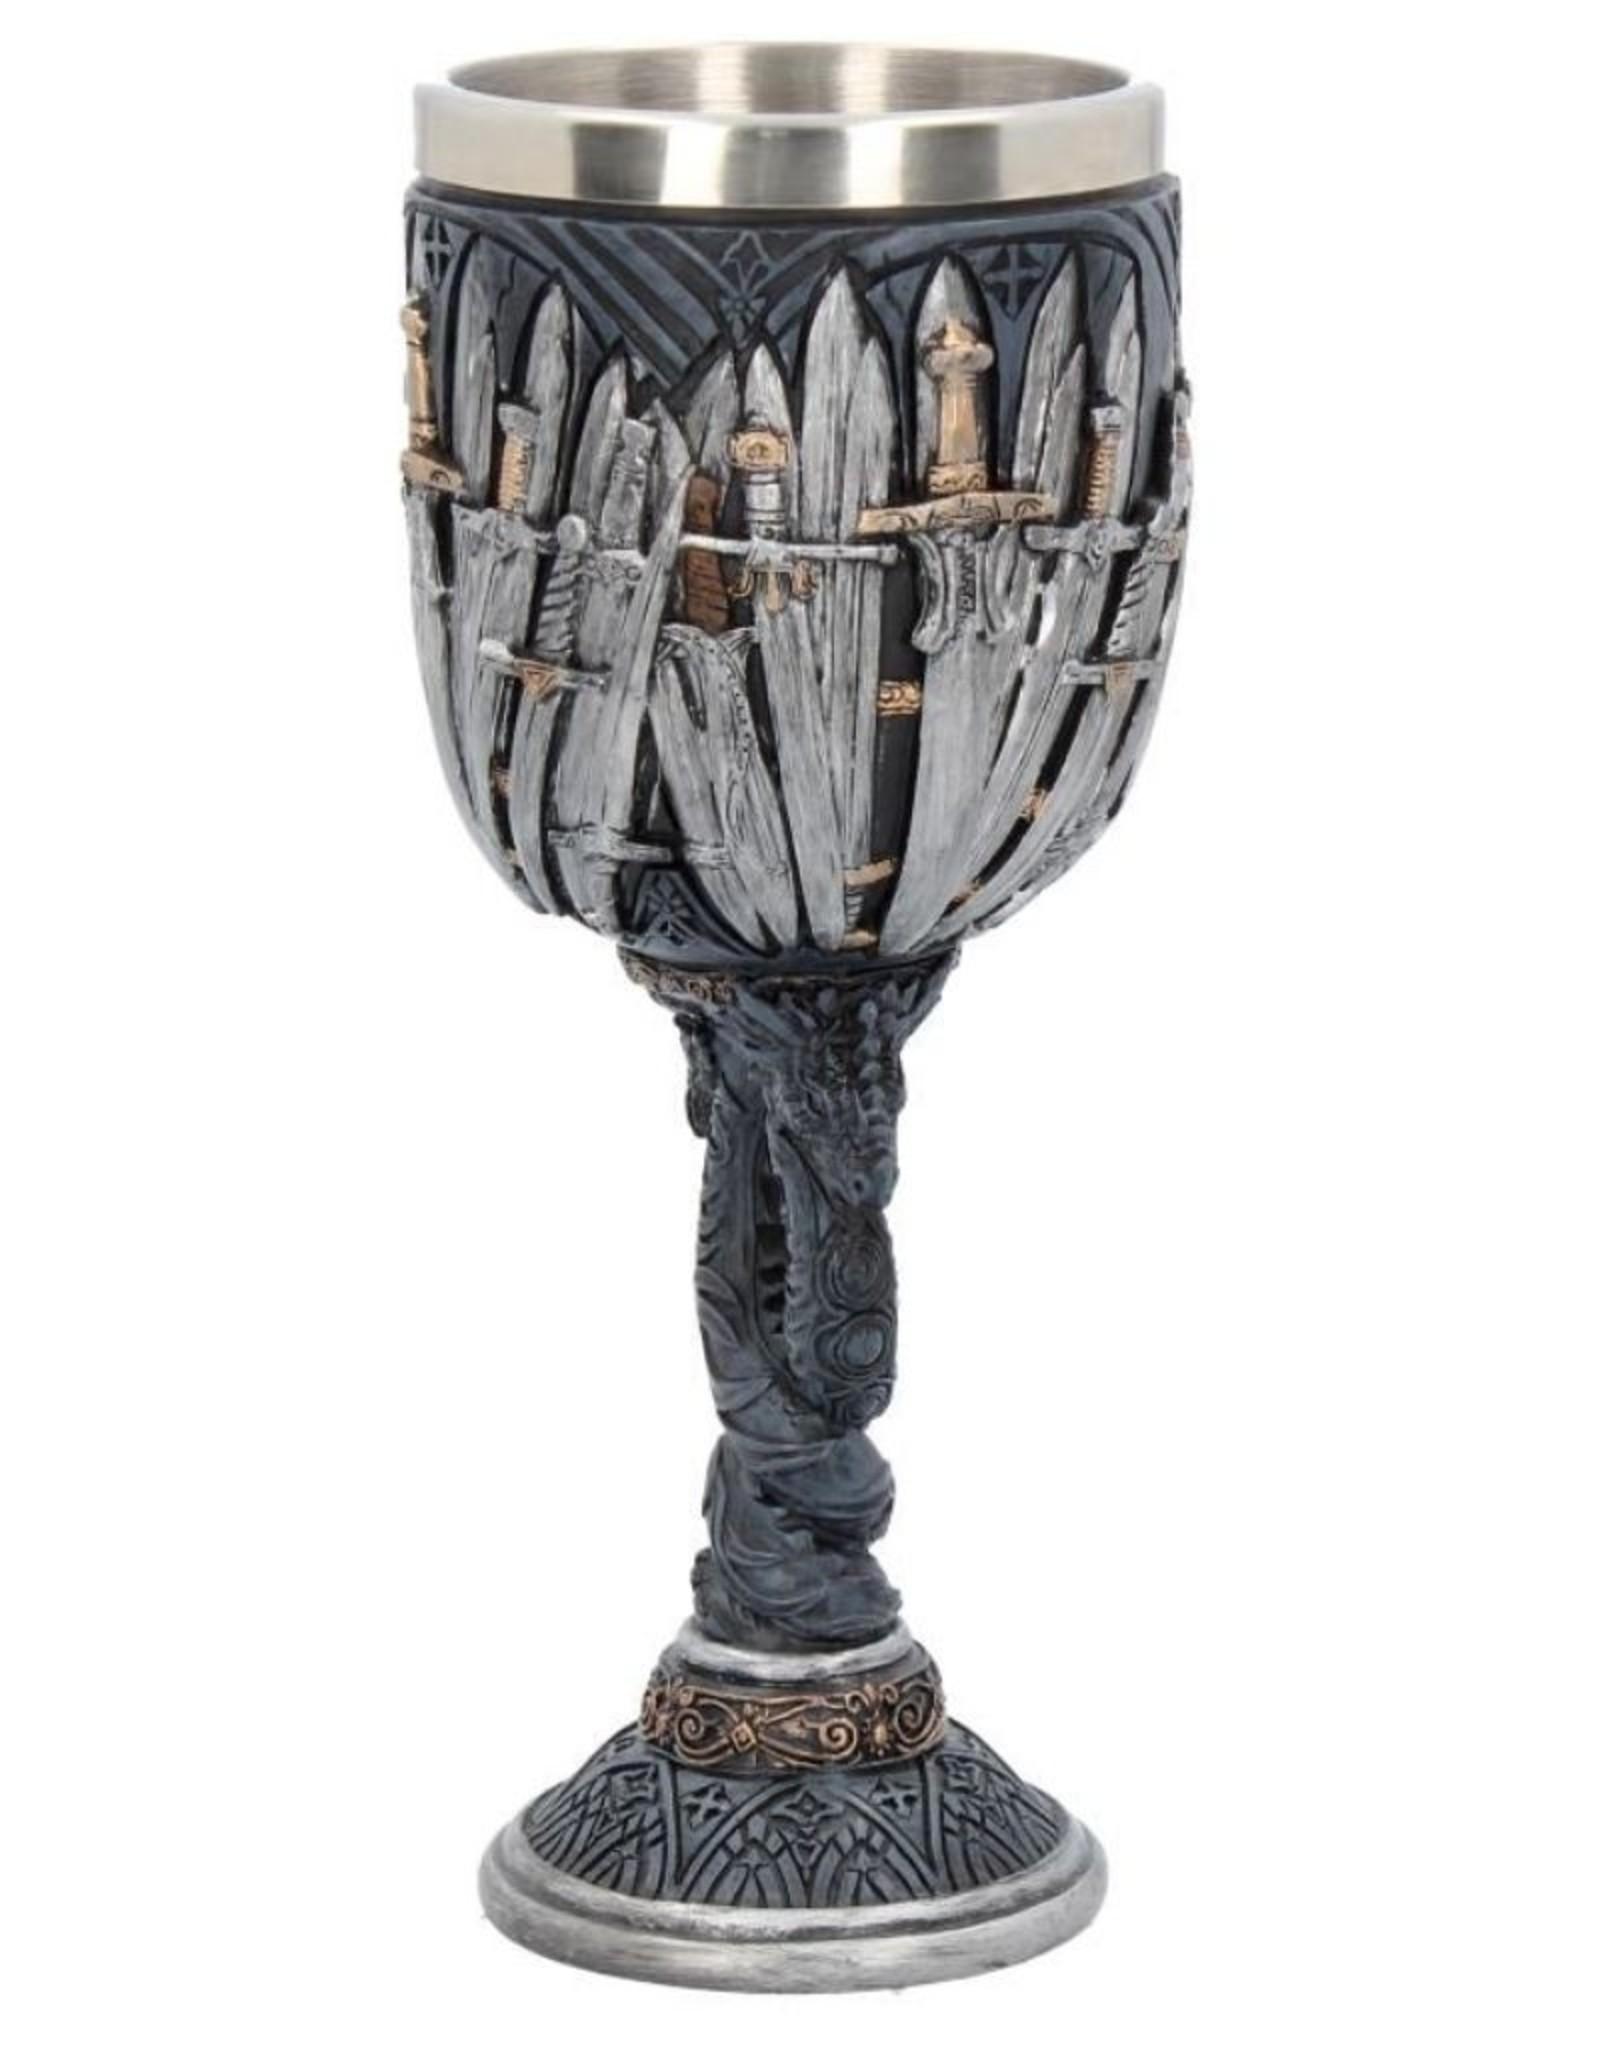 Alator Bekers en Kelken - Middeleeuwse kelk Sword Dragon  - Nemesis Now